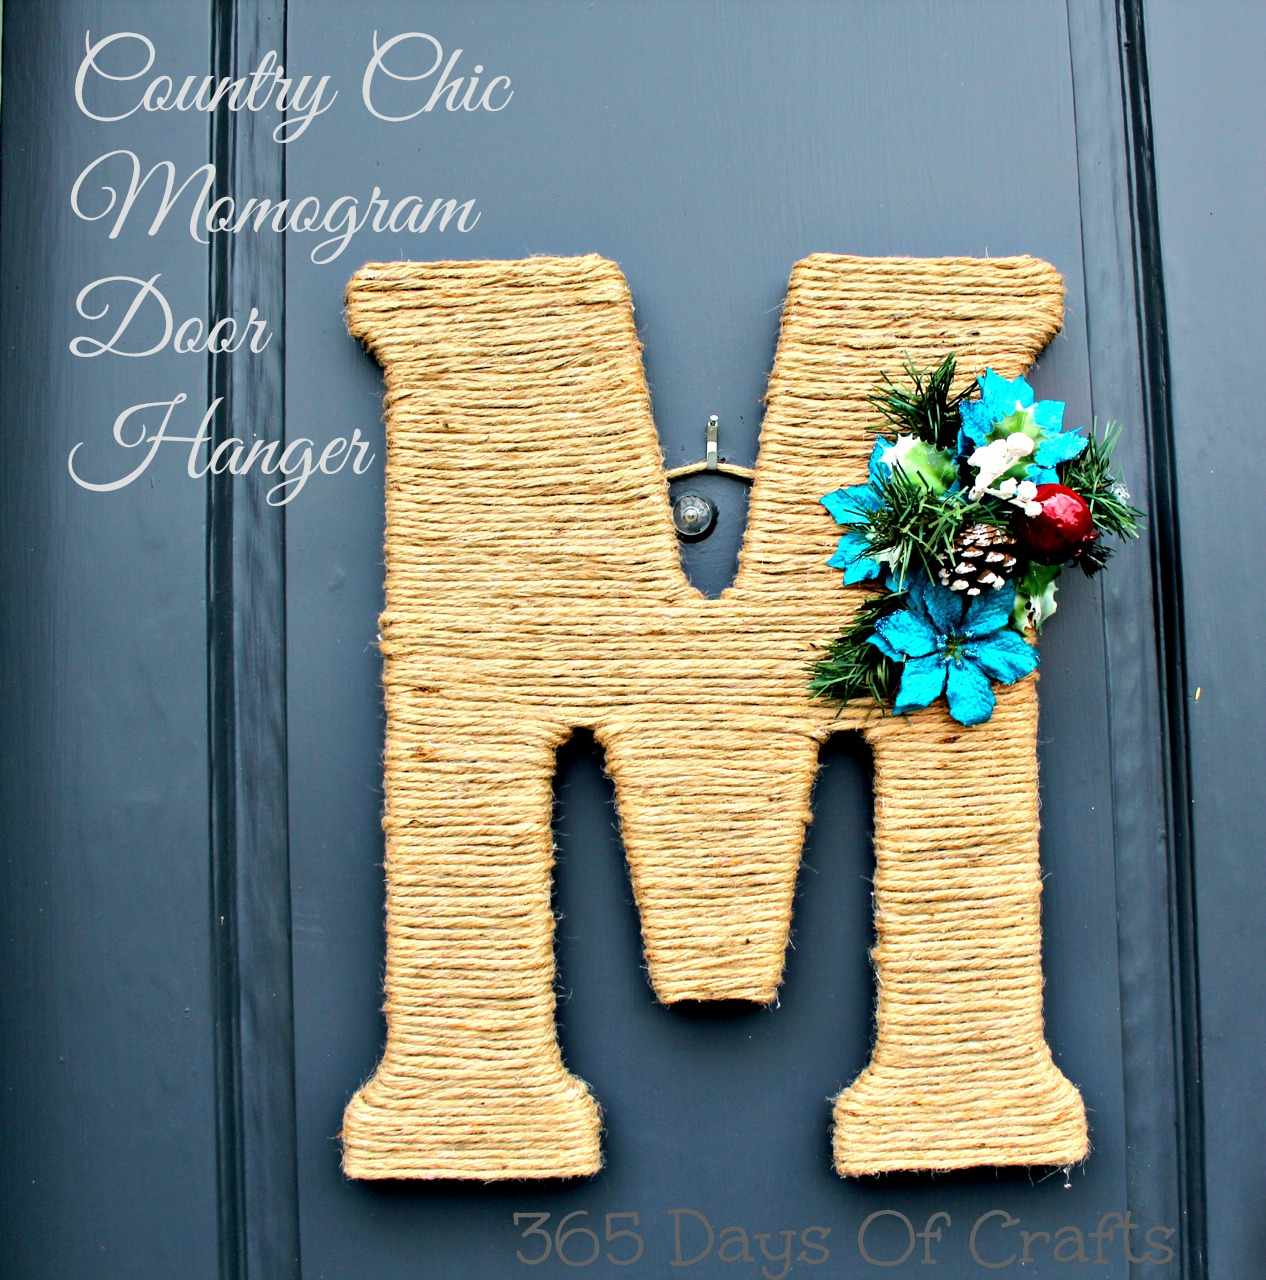 Monogram Door Hanger Diy Tutorial Using Jute And Hot Glue Gun